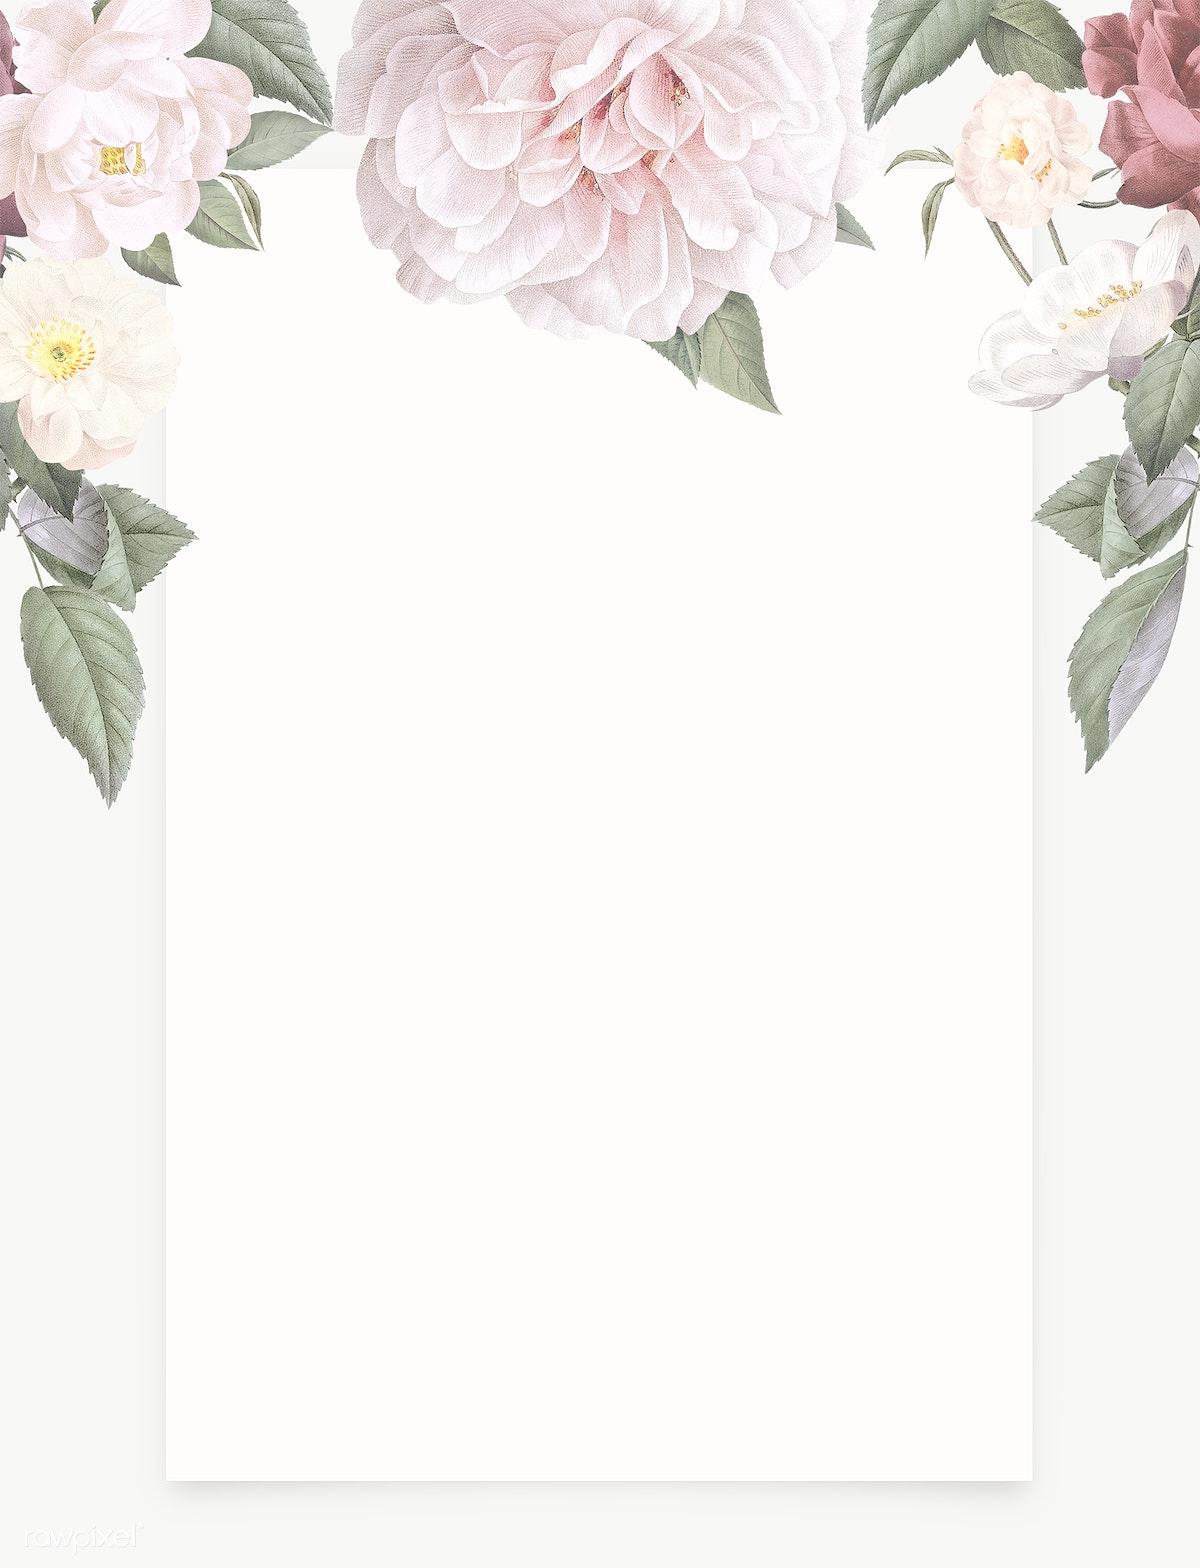 Feminine flowers border | Royalty free transparent png ...